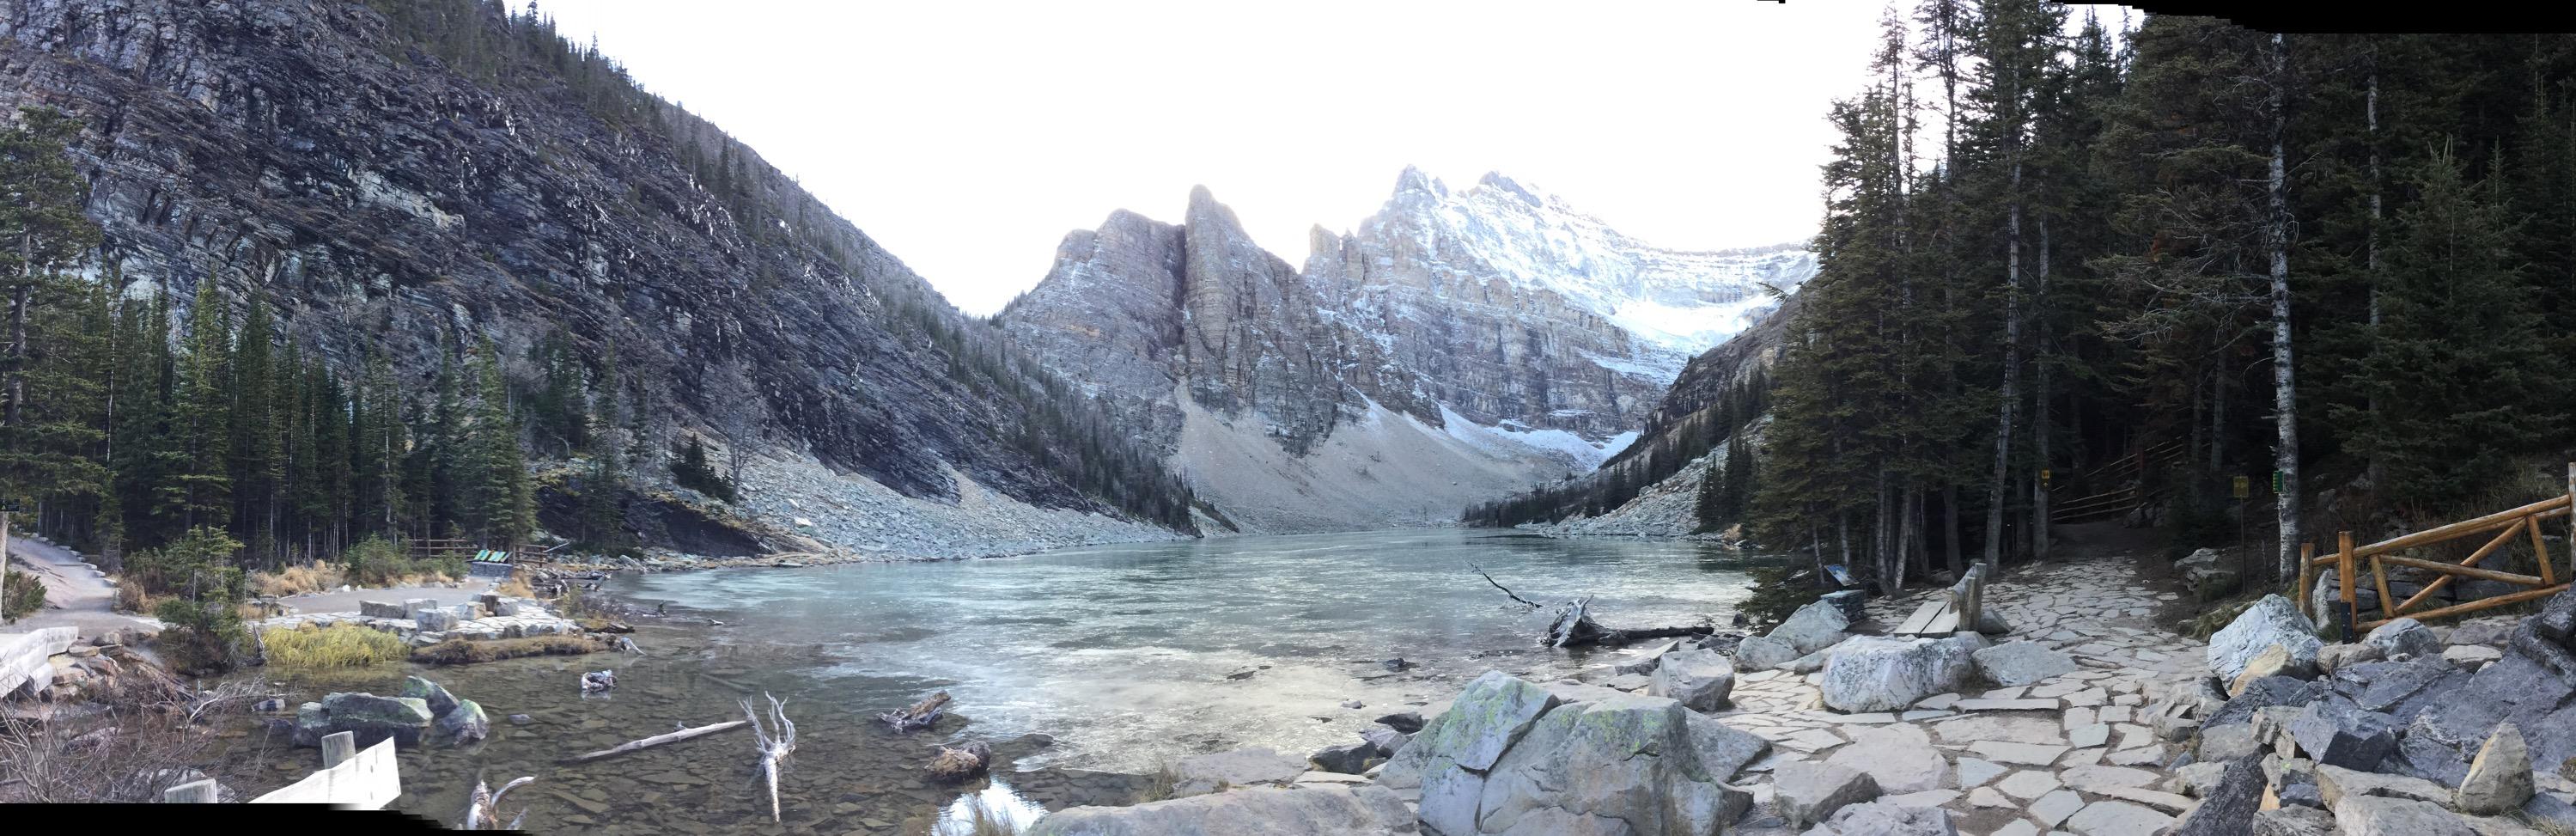 lago agnes en Lake Louise